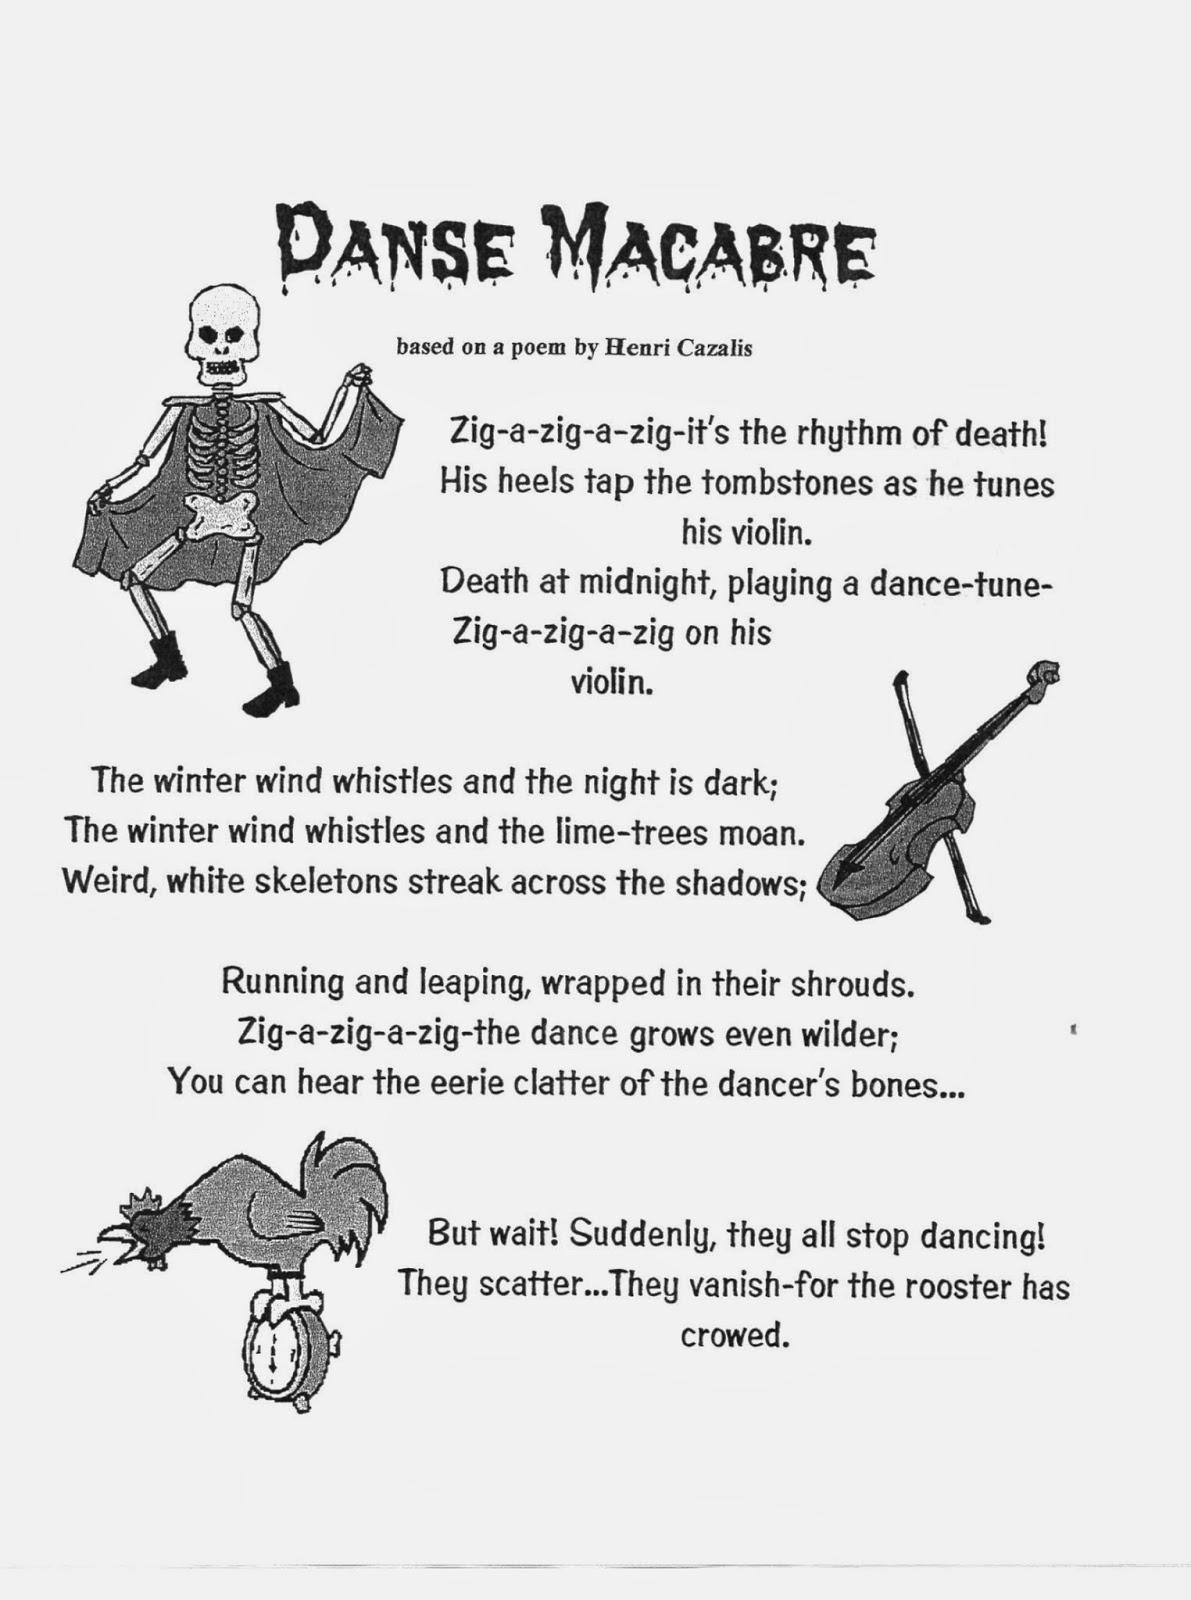 Nhcs Music Education Danse Macabre Mood